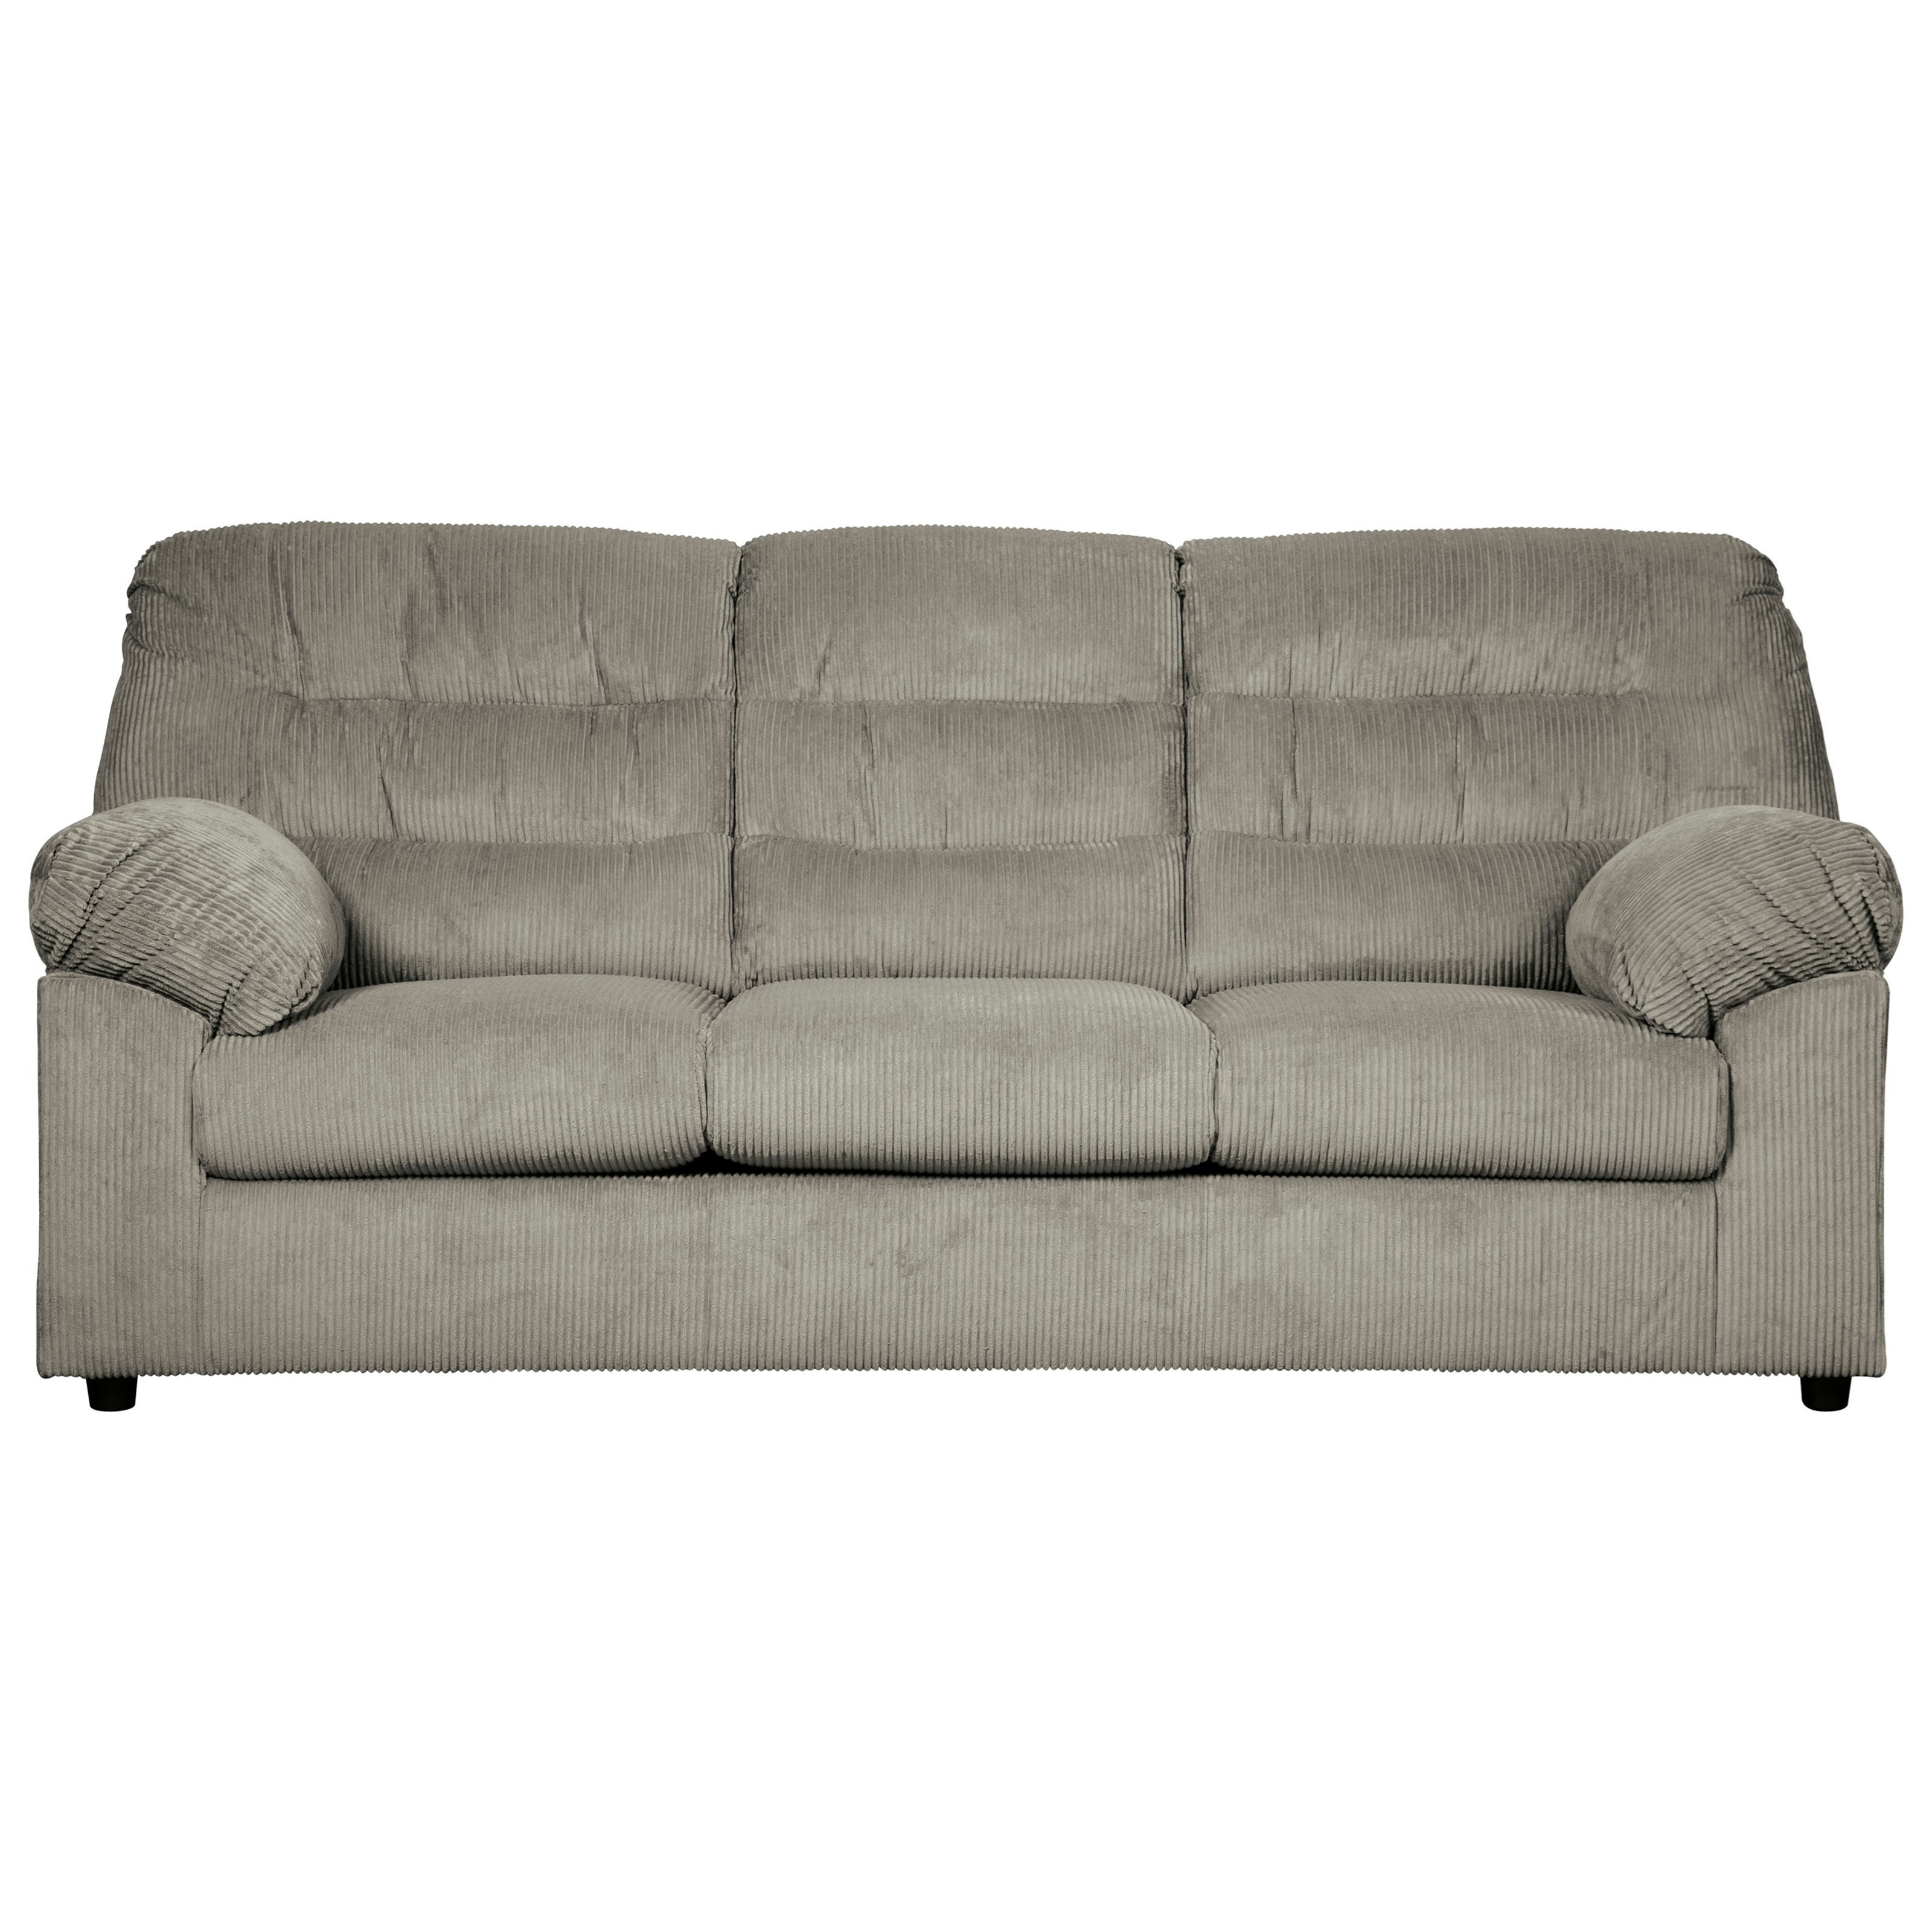 corduroy fabric sofa lazar sofas bed joan el thesofa